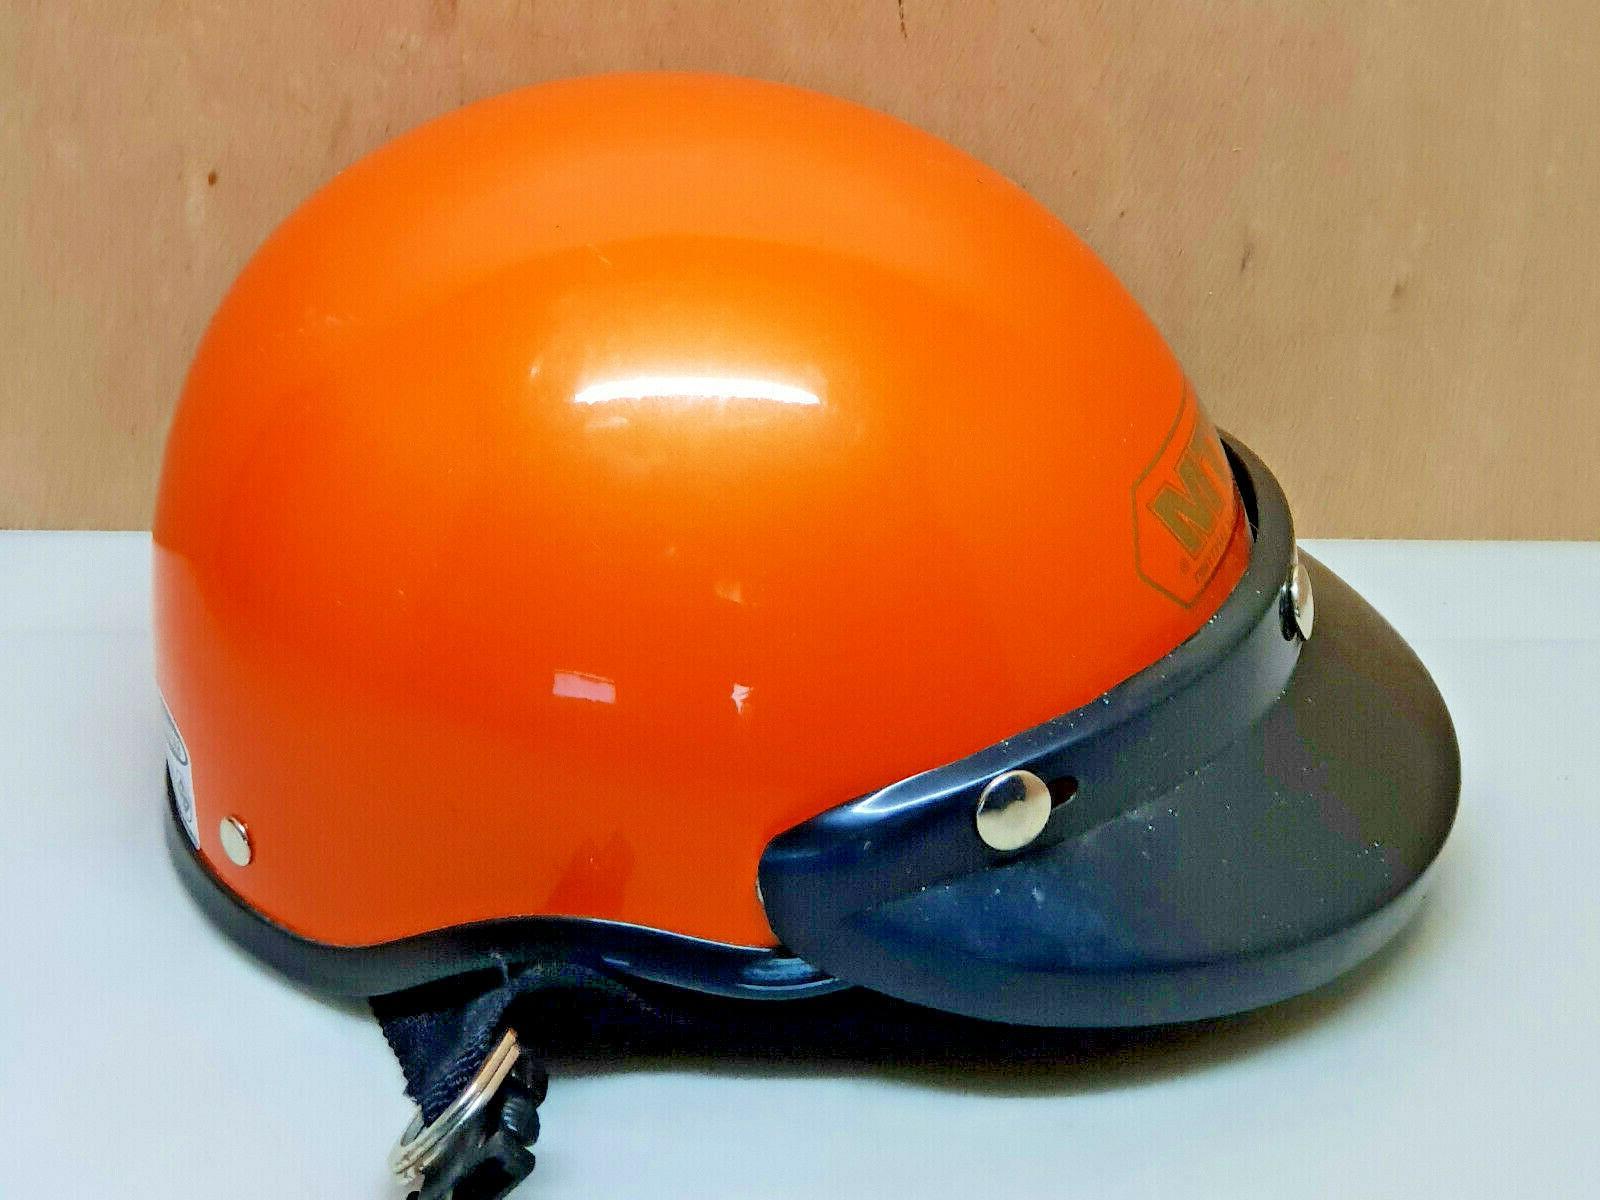 casque moto cyclomoteur marque safetymet orange taille